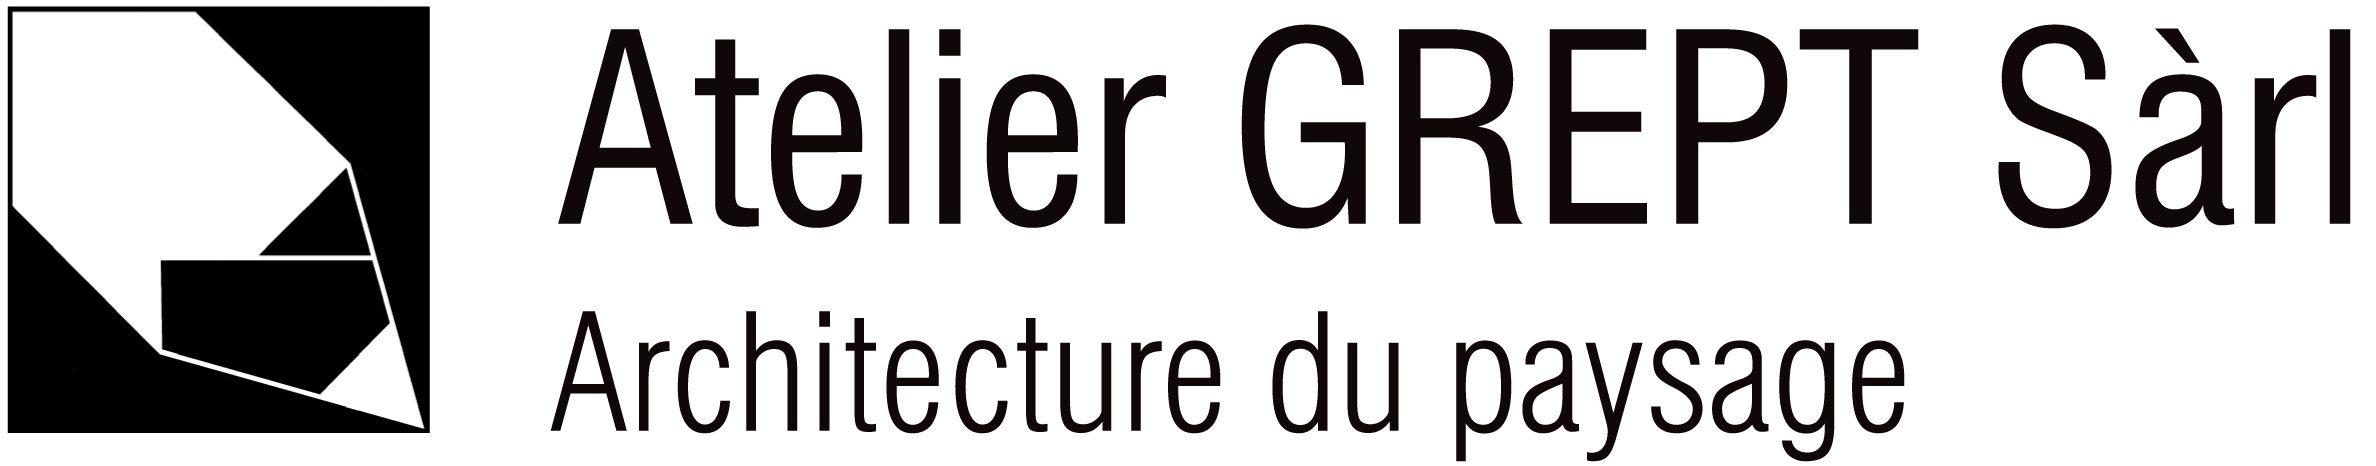 Atelier GREPT Sàrl